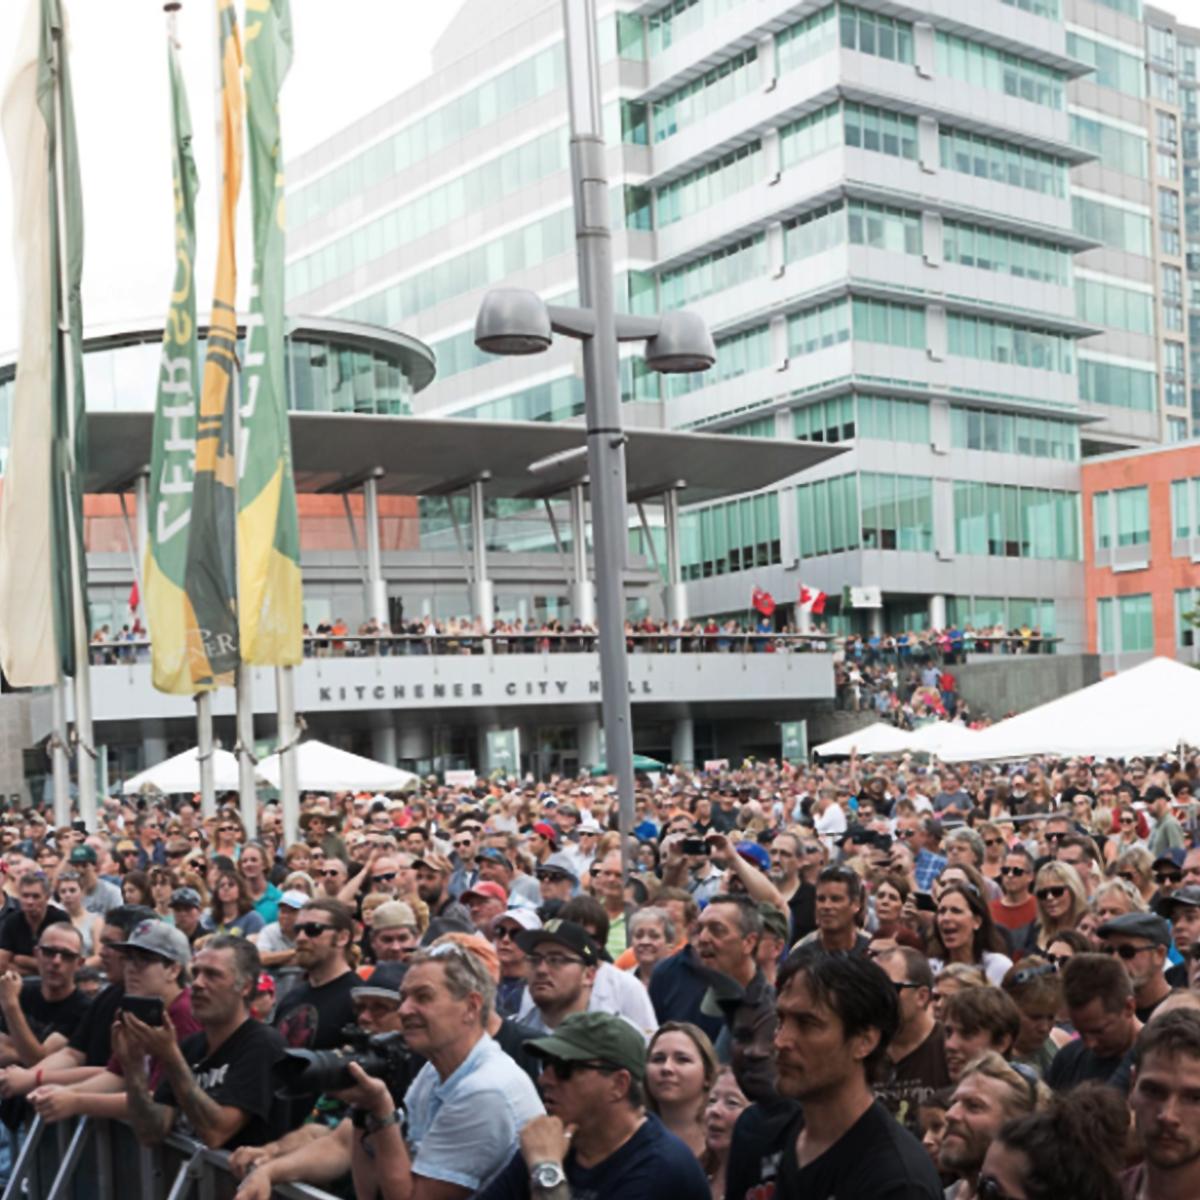 Kitchener Blues Festival Cancelled